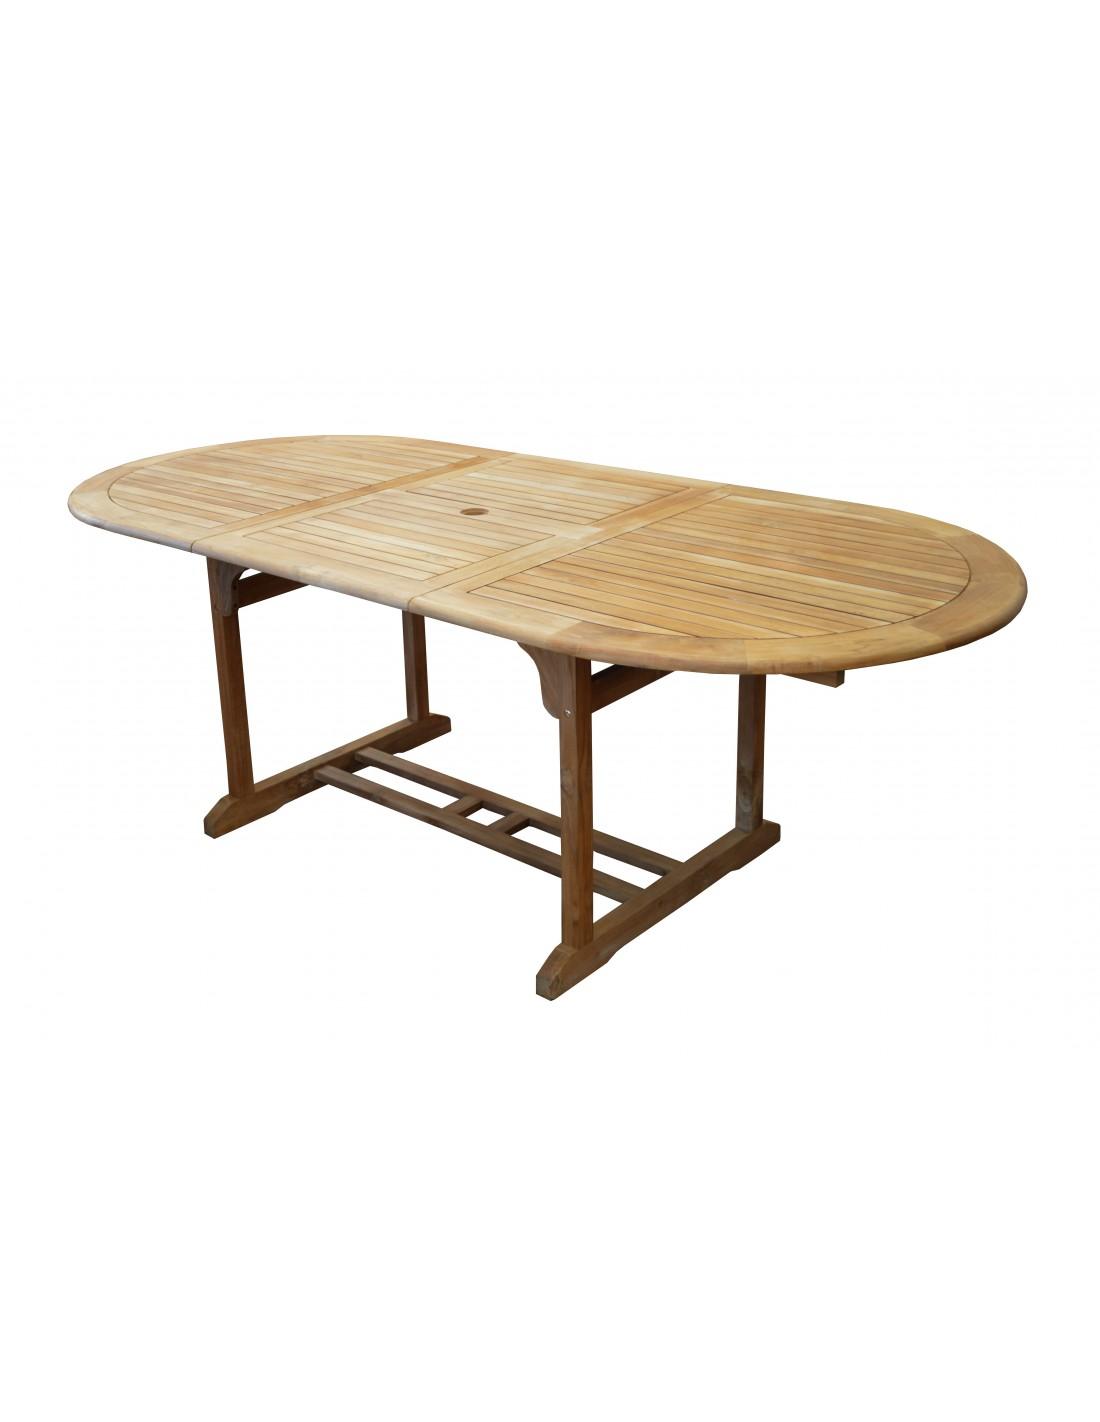 table de jardin hampton en teck allonges 160 220 x 100 cm proloisirs. Black Bedroom Furniture Sets. Home Design Ideas